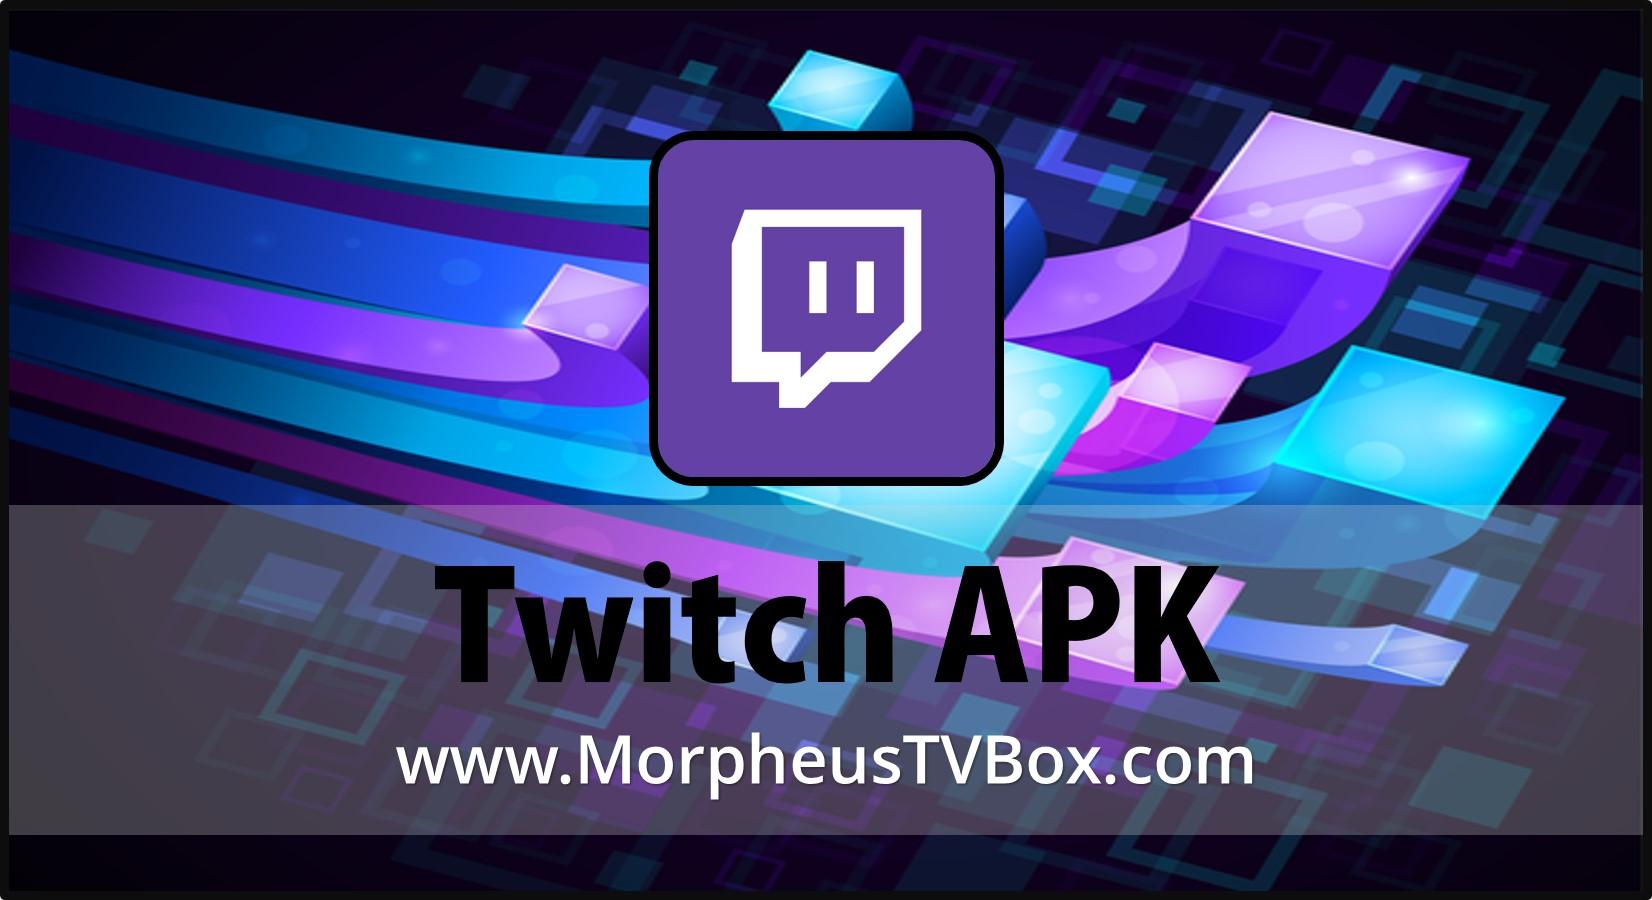 twitch apk download